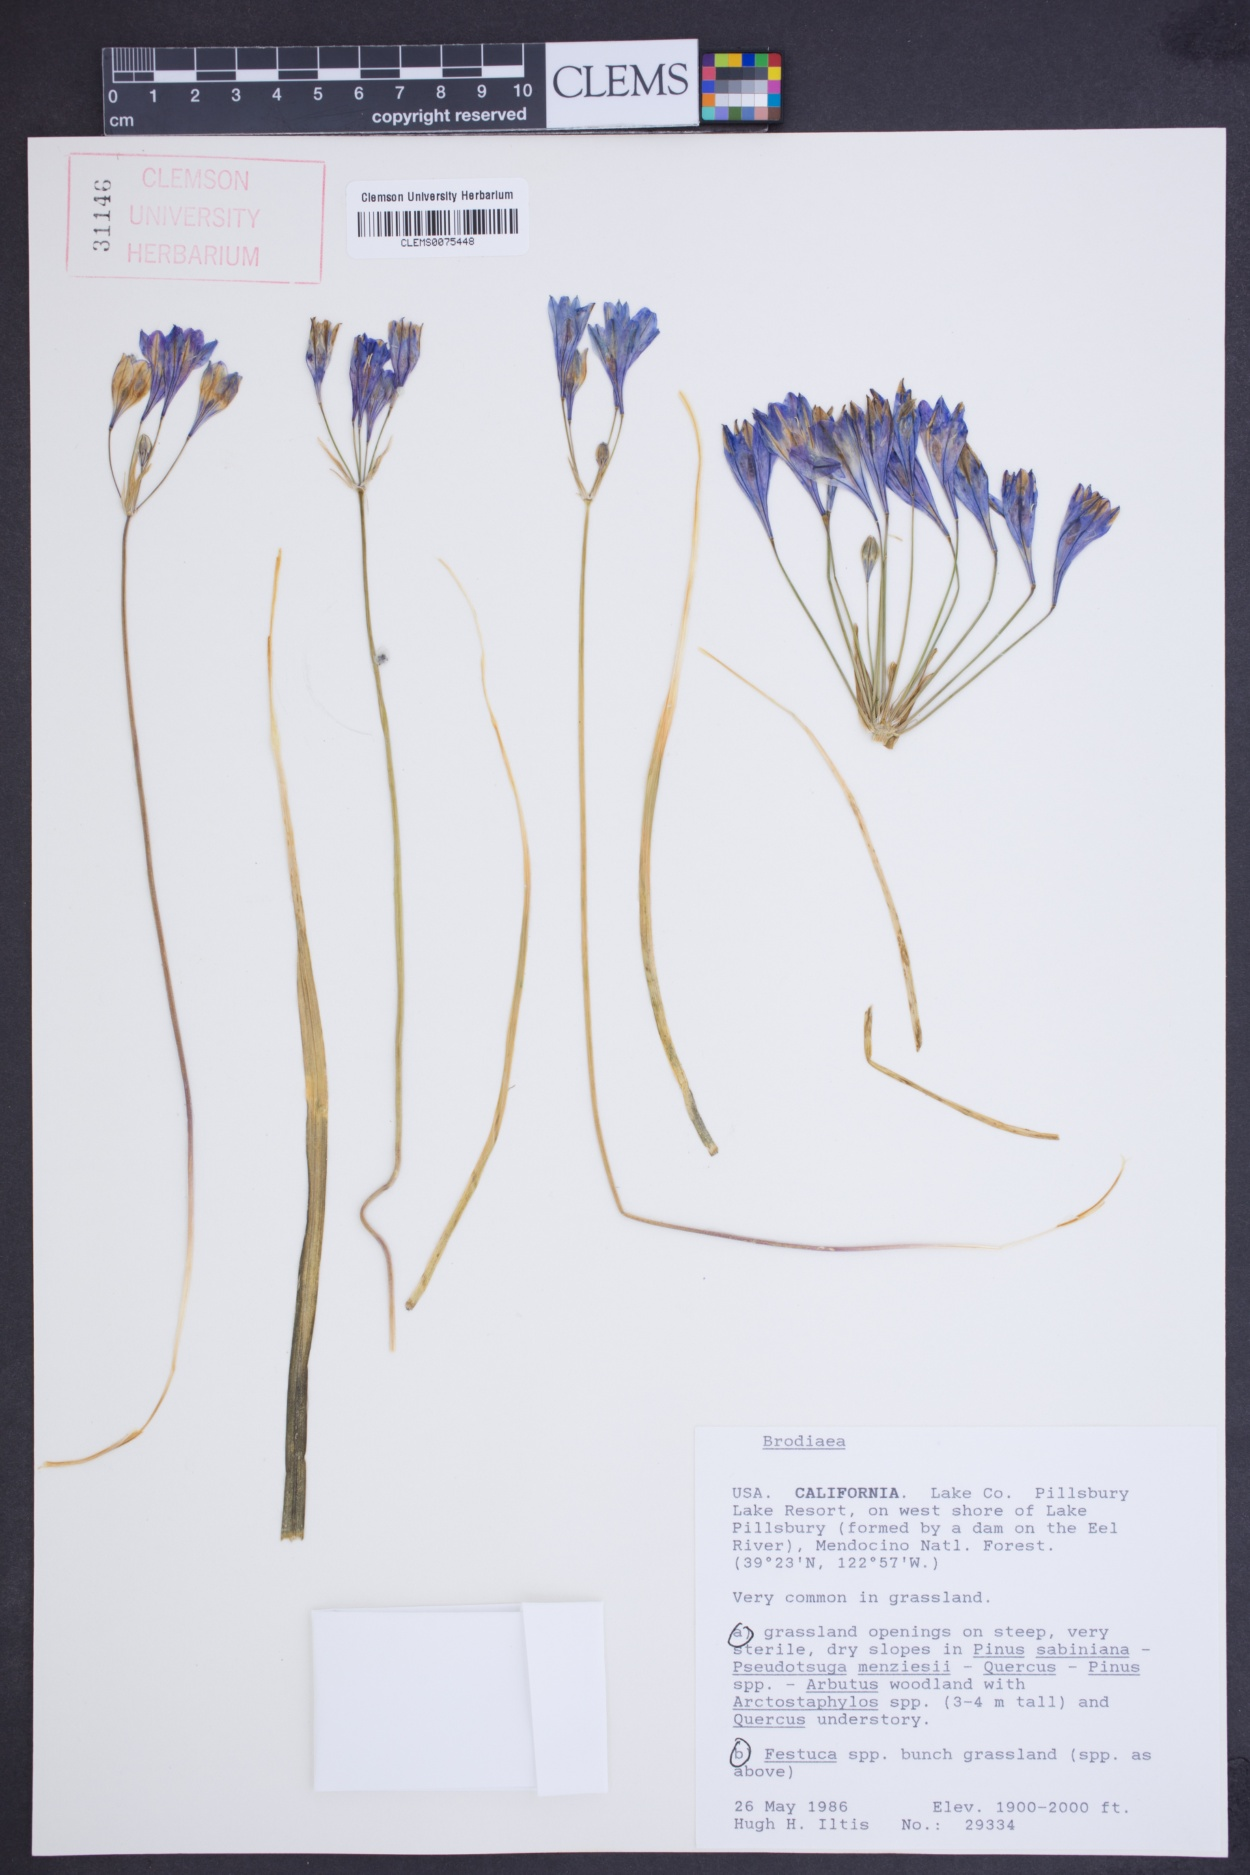 Brodiaea image